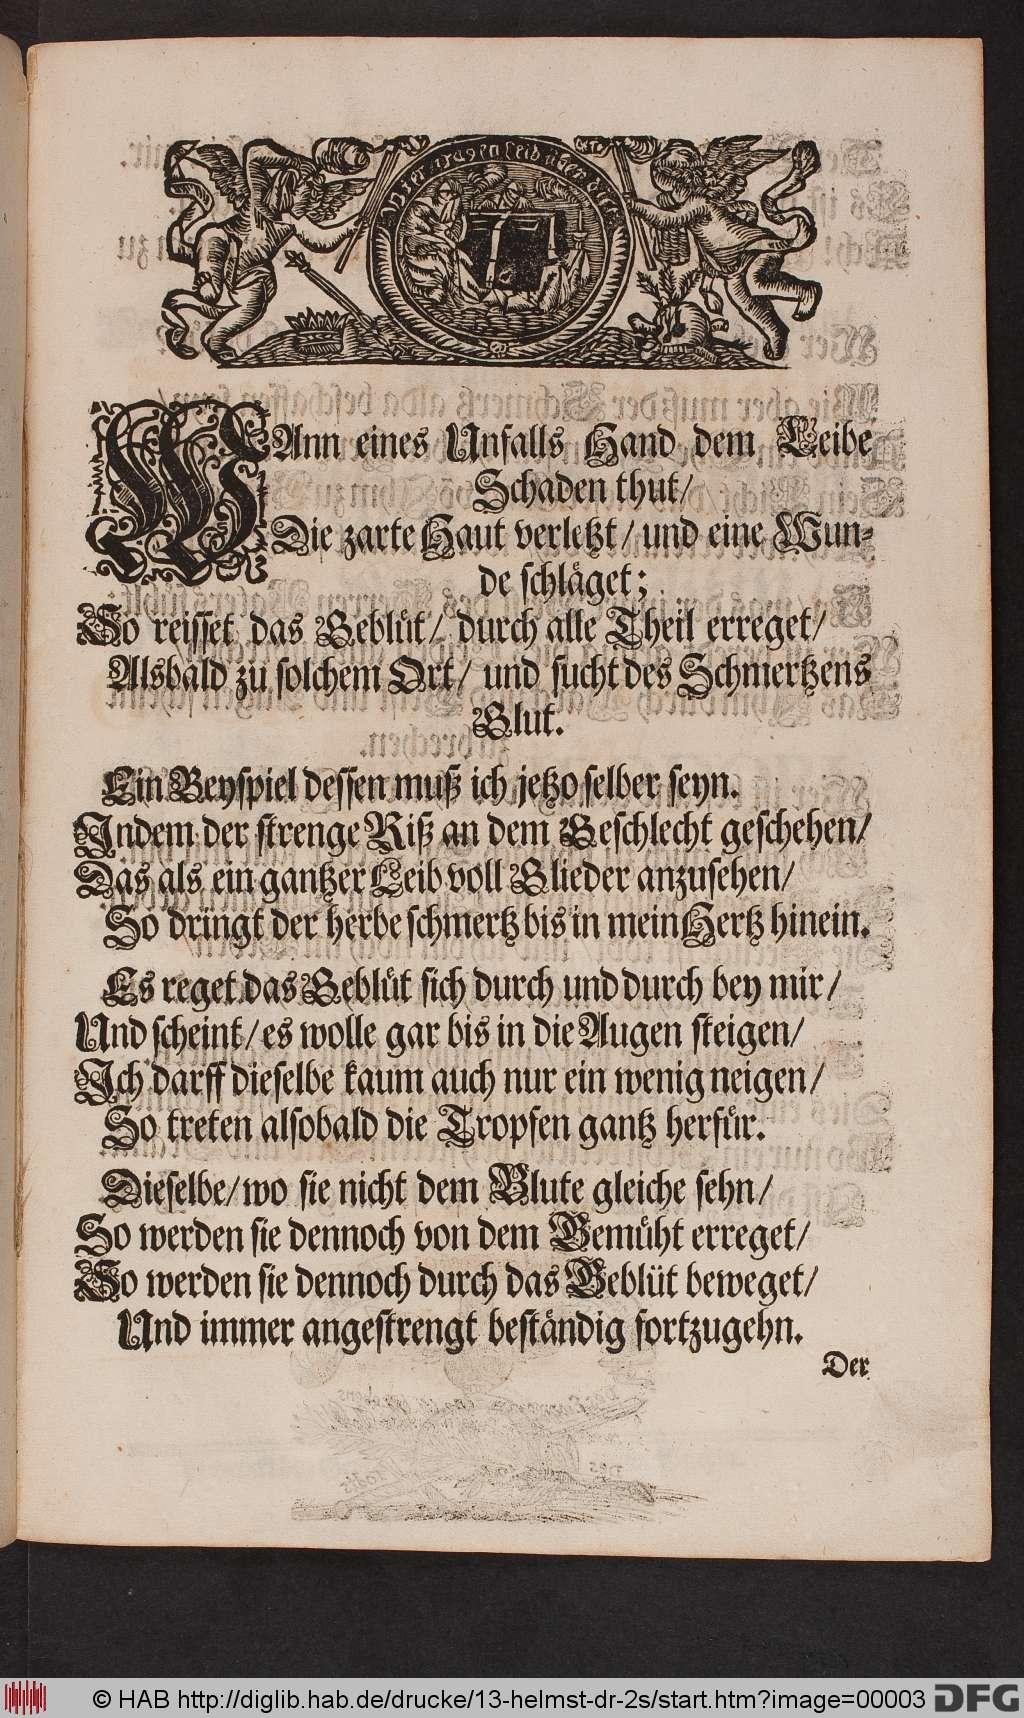 http://diglib.hab.de/drucke/13-helmst-dr-2s/00003.jpg